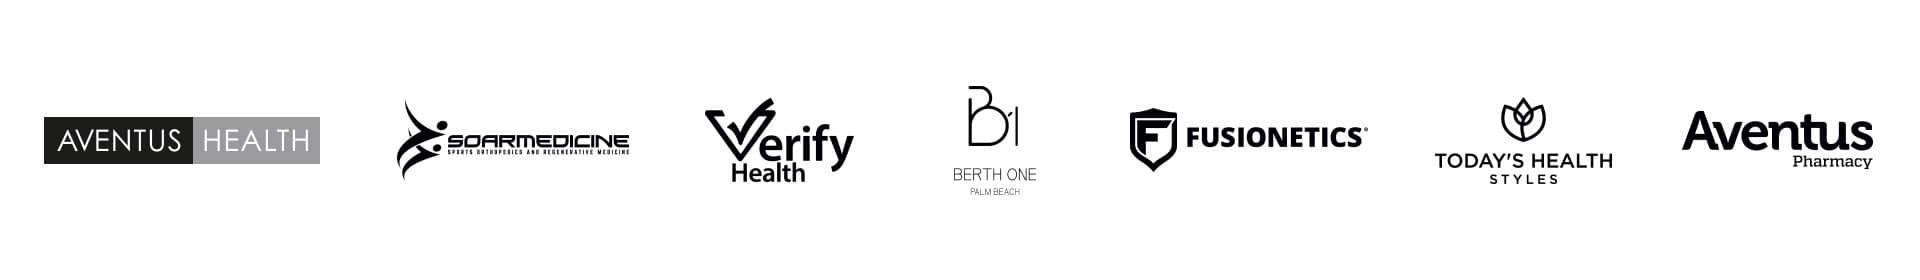 Logos for the website Health & Wellness